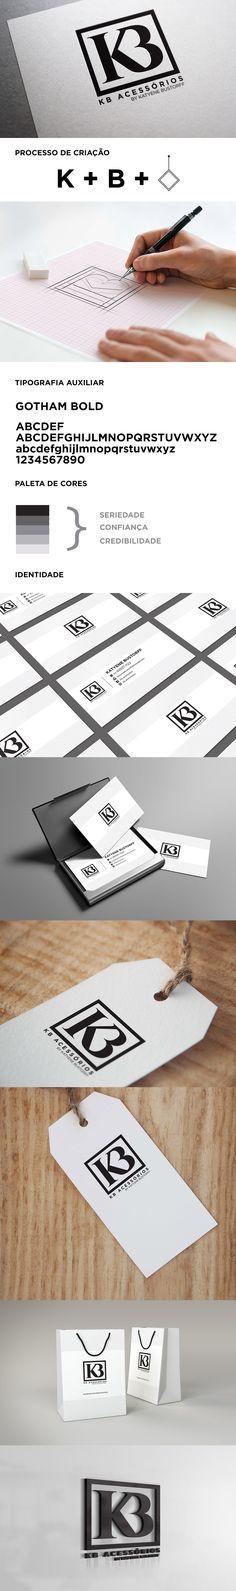 Marca e Identidade Visual